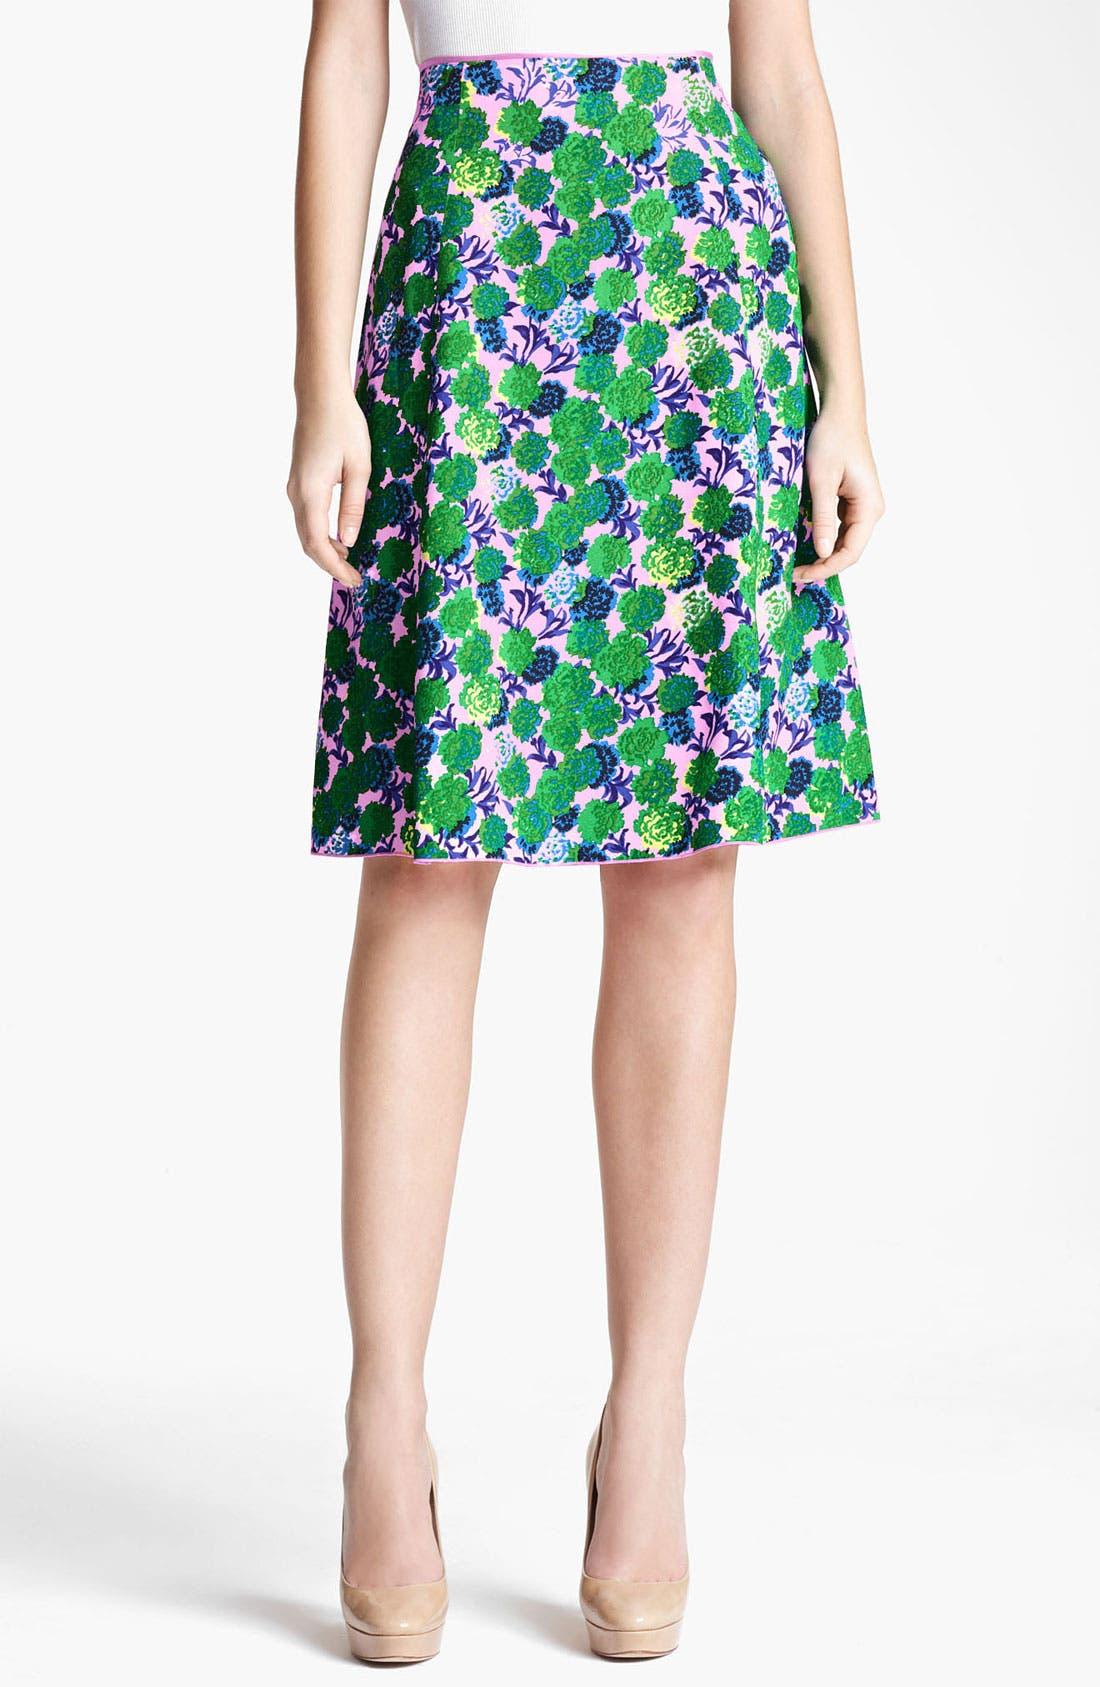 Alternate Image 1 Selected - MARC JACOBS Floral Skirt